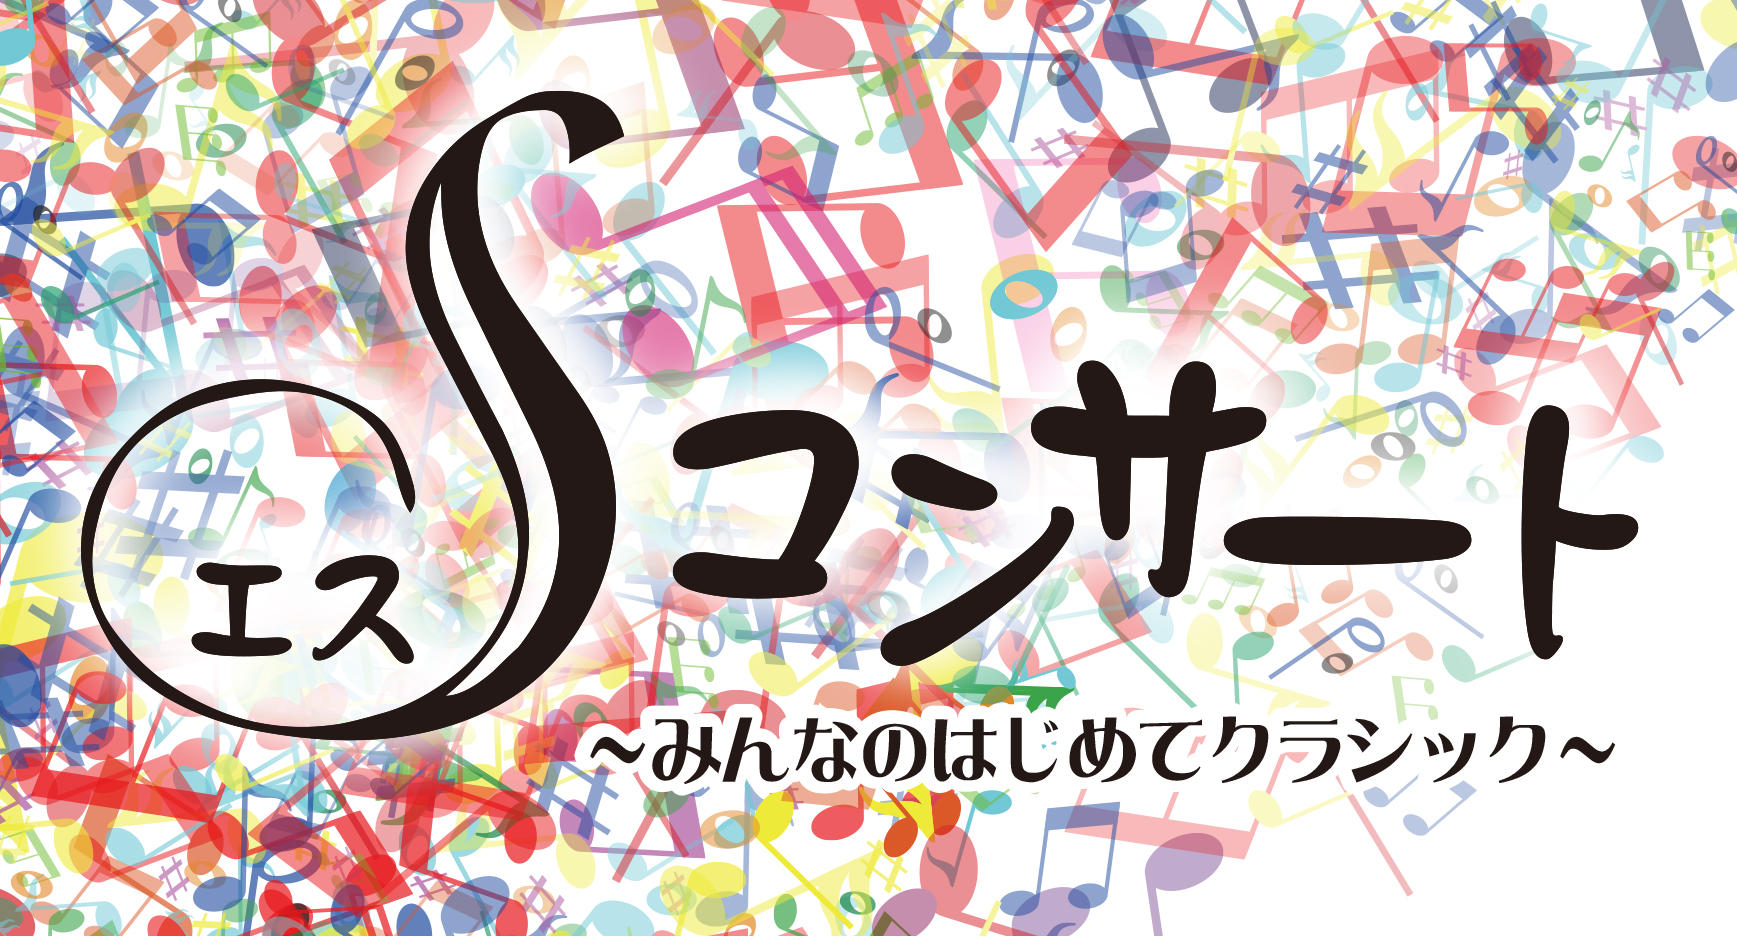 Sコンサート ~みんなのはじめてクラシック~